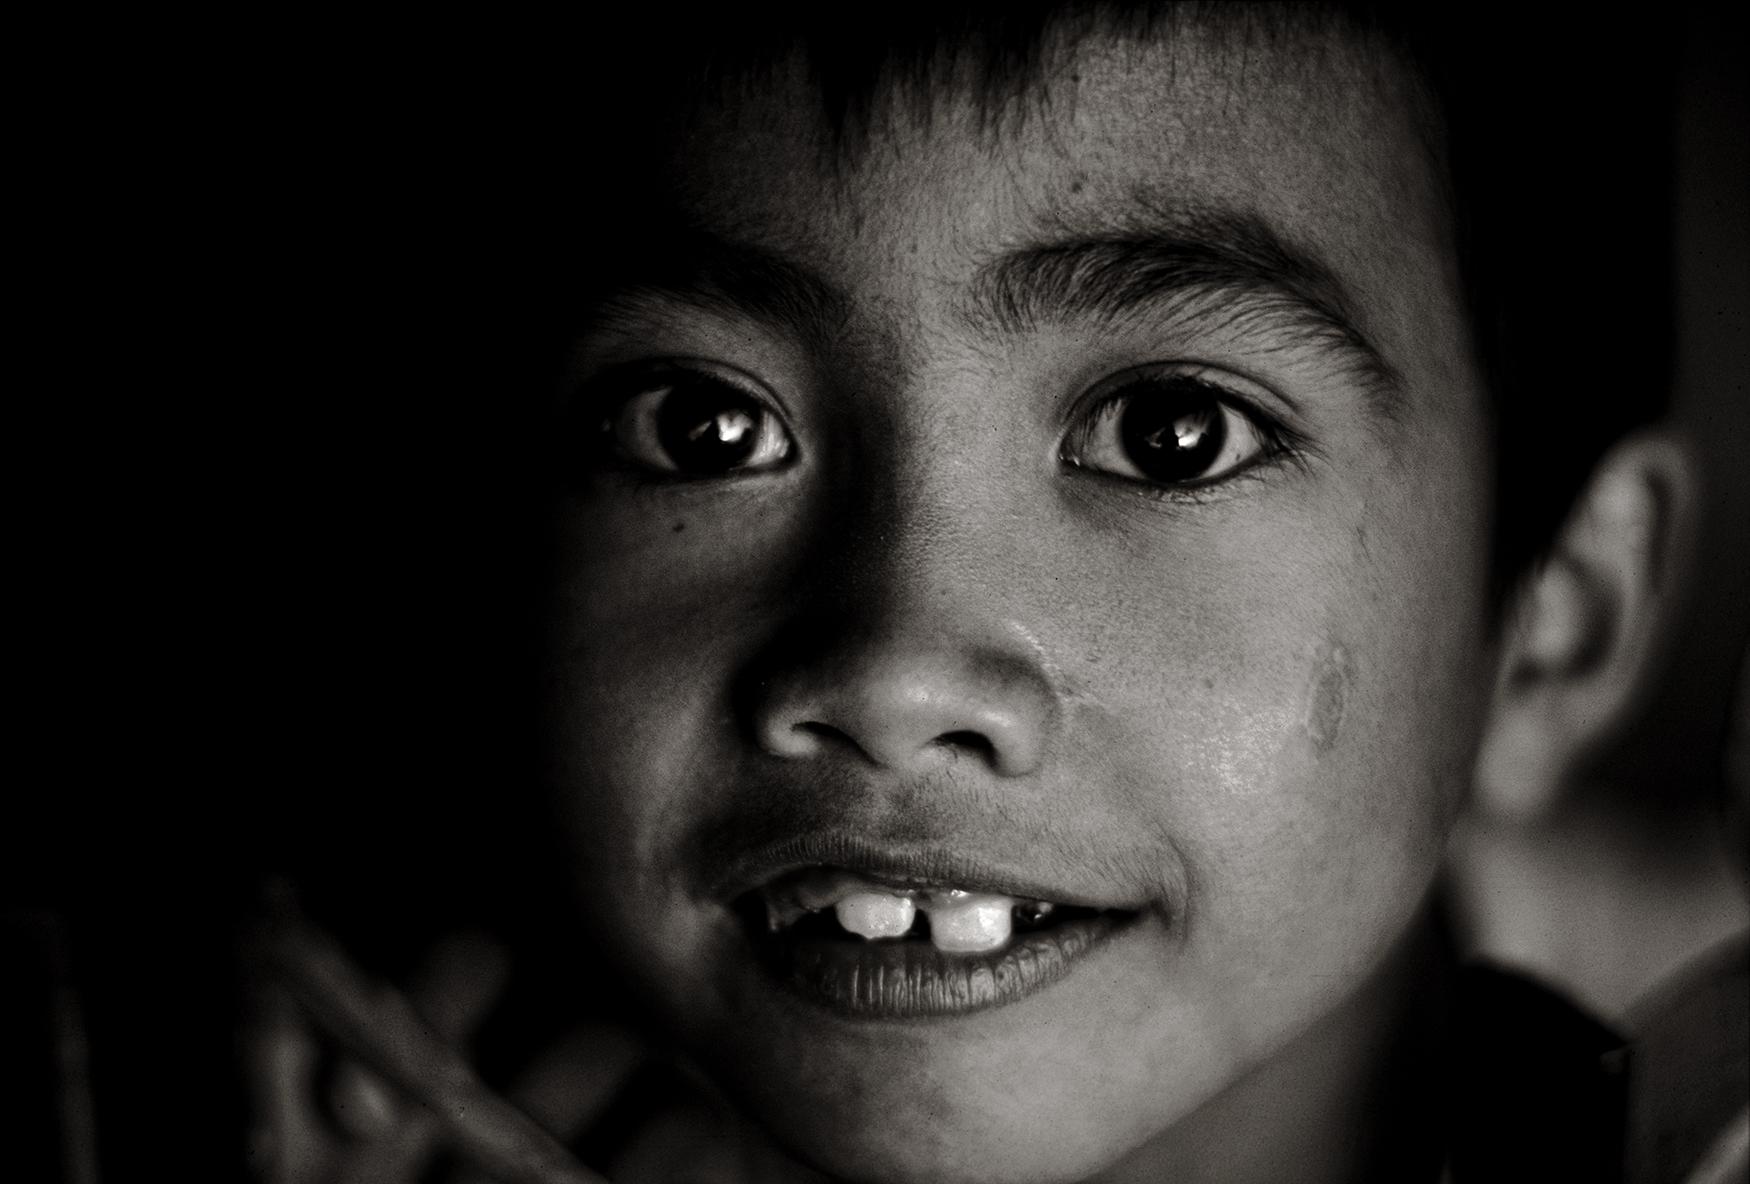 Indonesian Visage 25